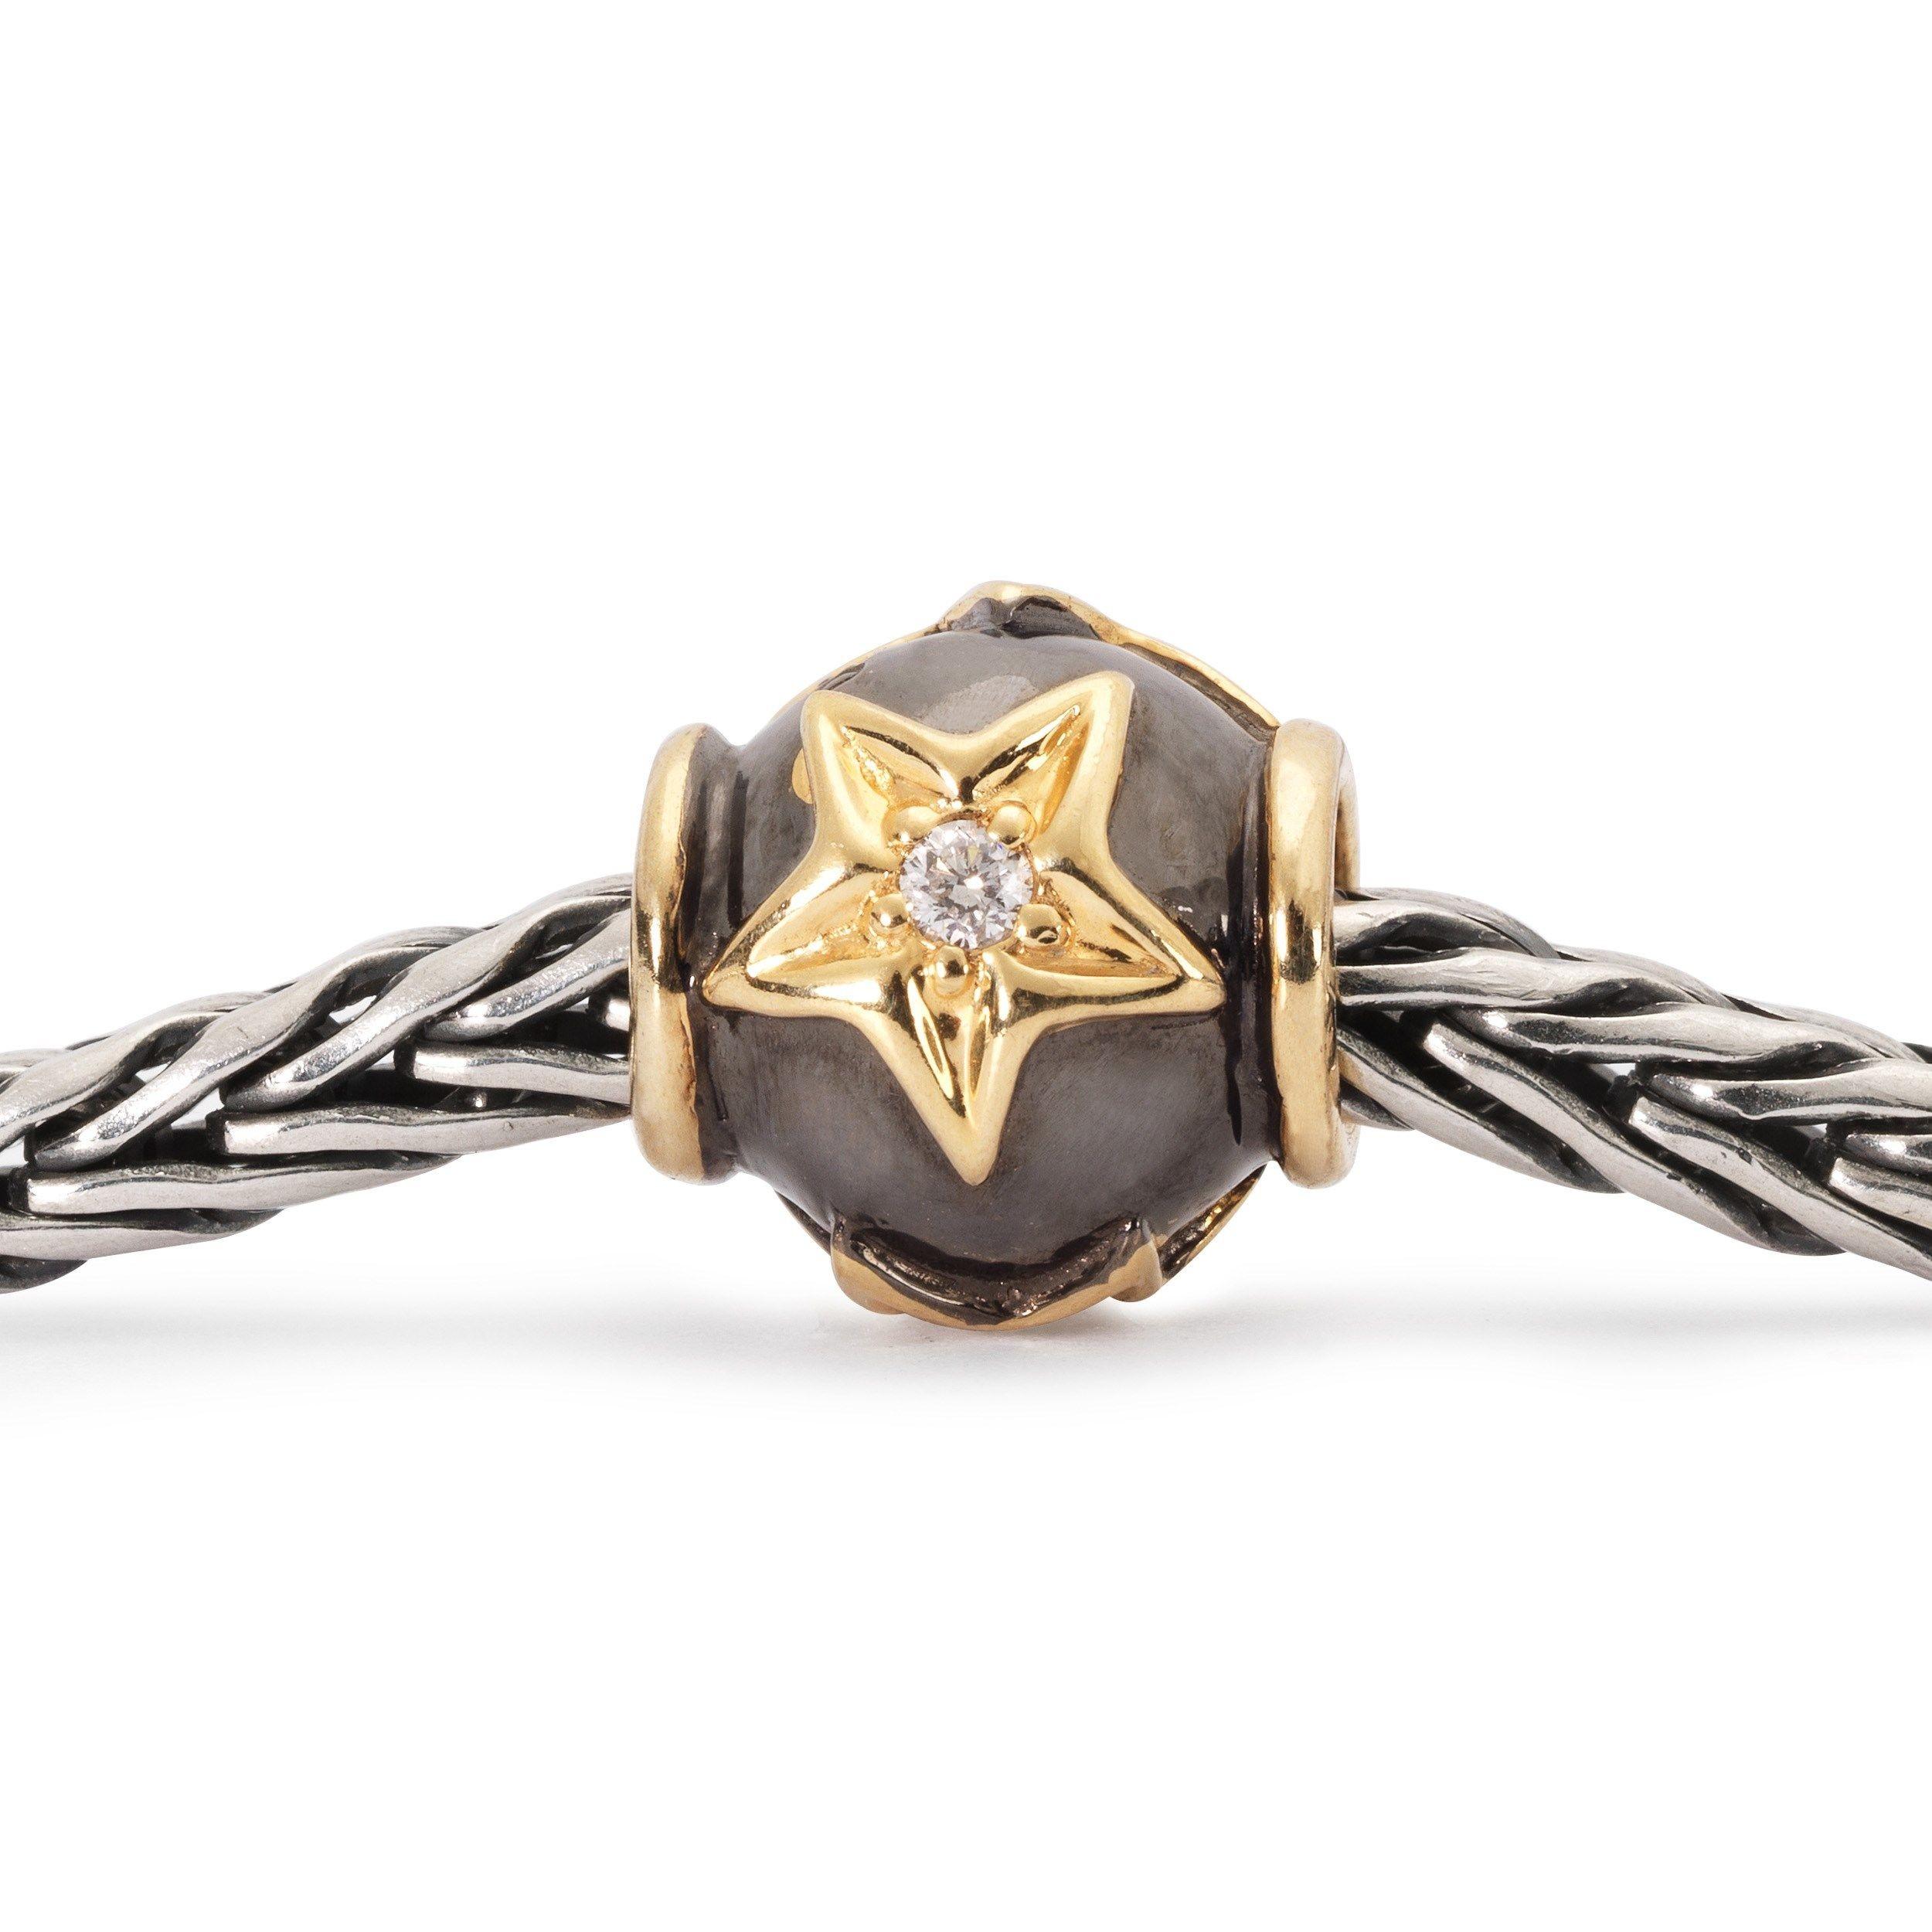 Зірки Золото Діамант 40484dcc053a5